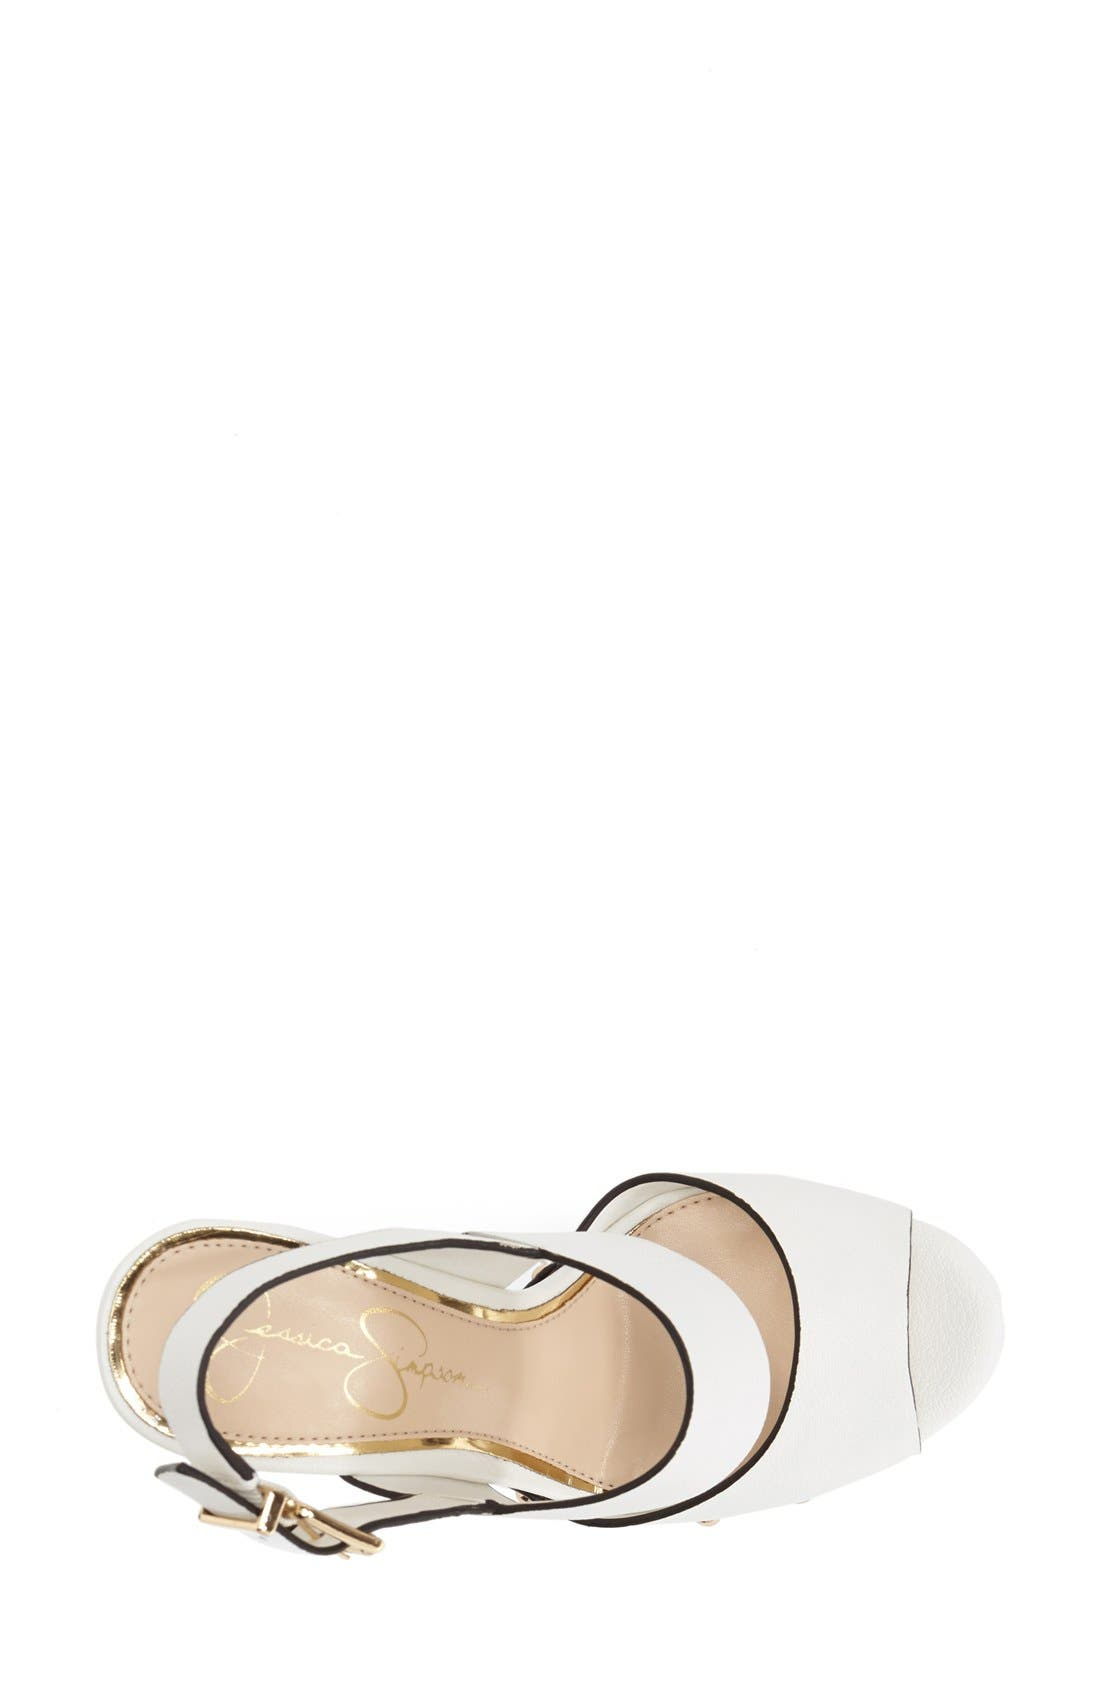 Alternate Image 3  - Jessica Simpson 'Dallis' Platform Sandal (Women)